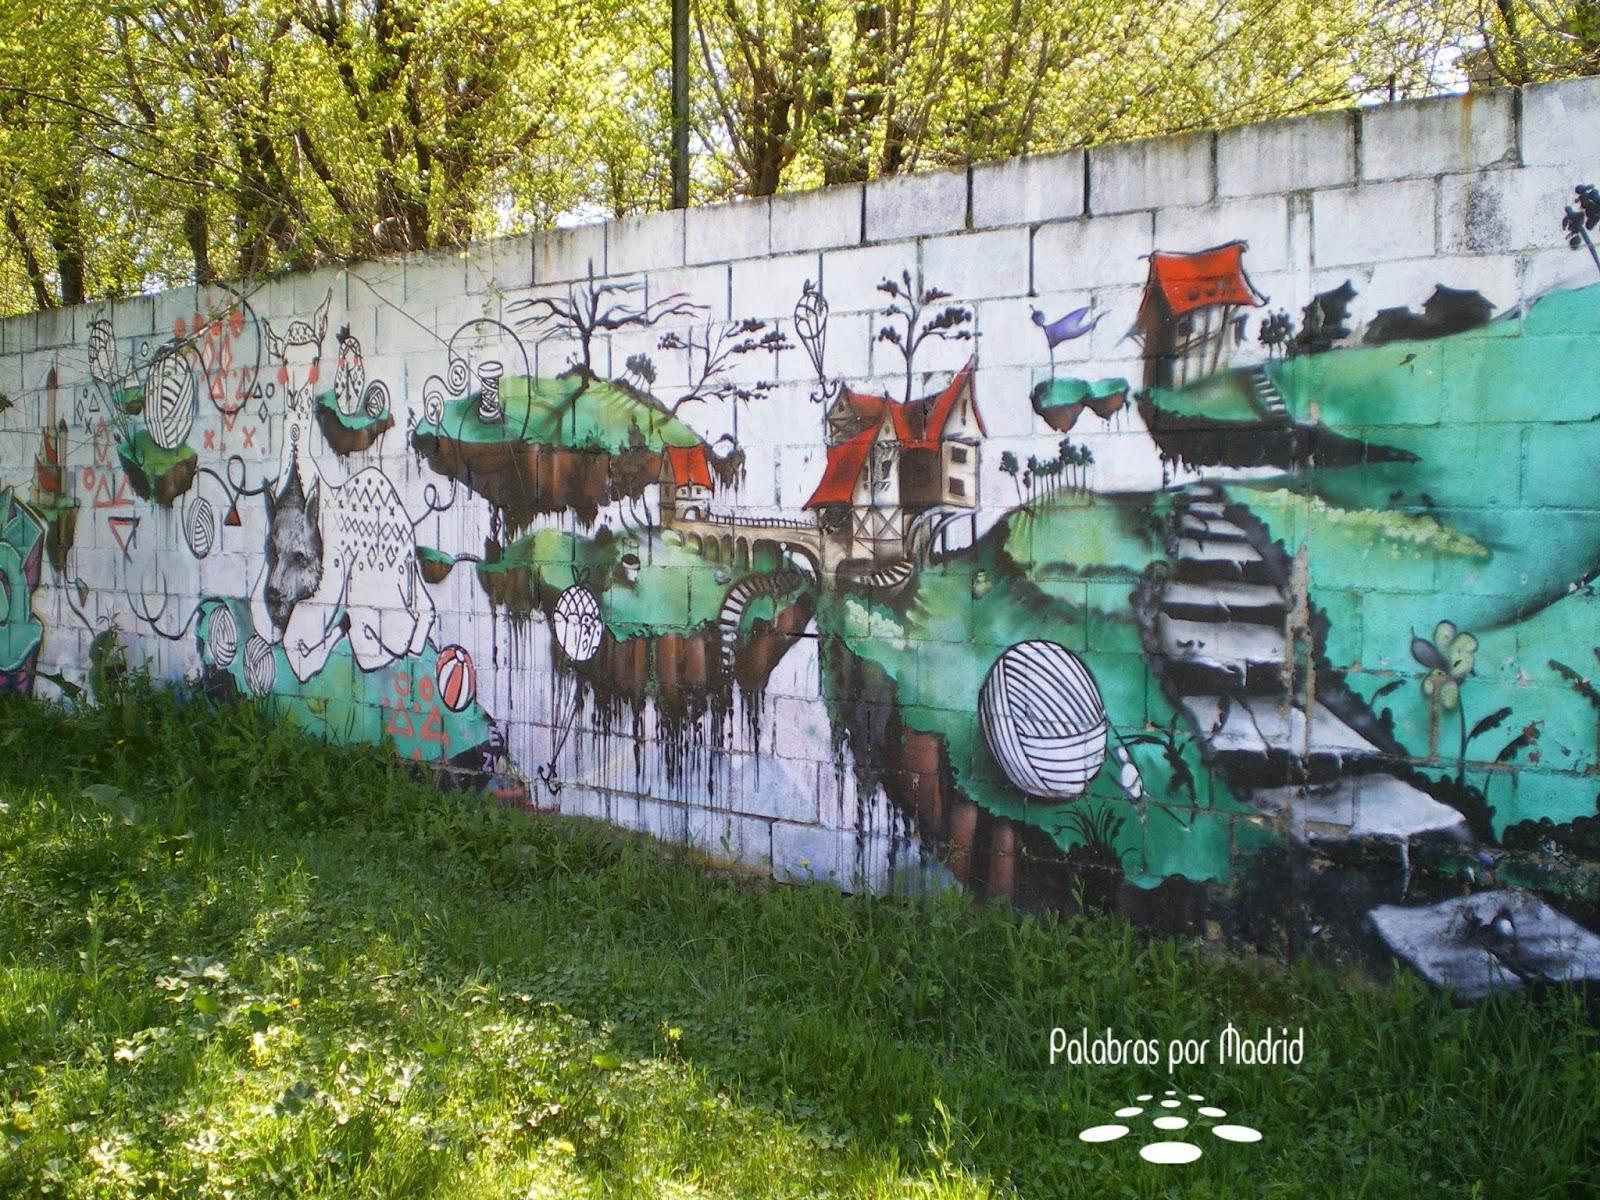 parque alameda de osuna